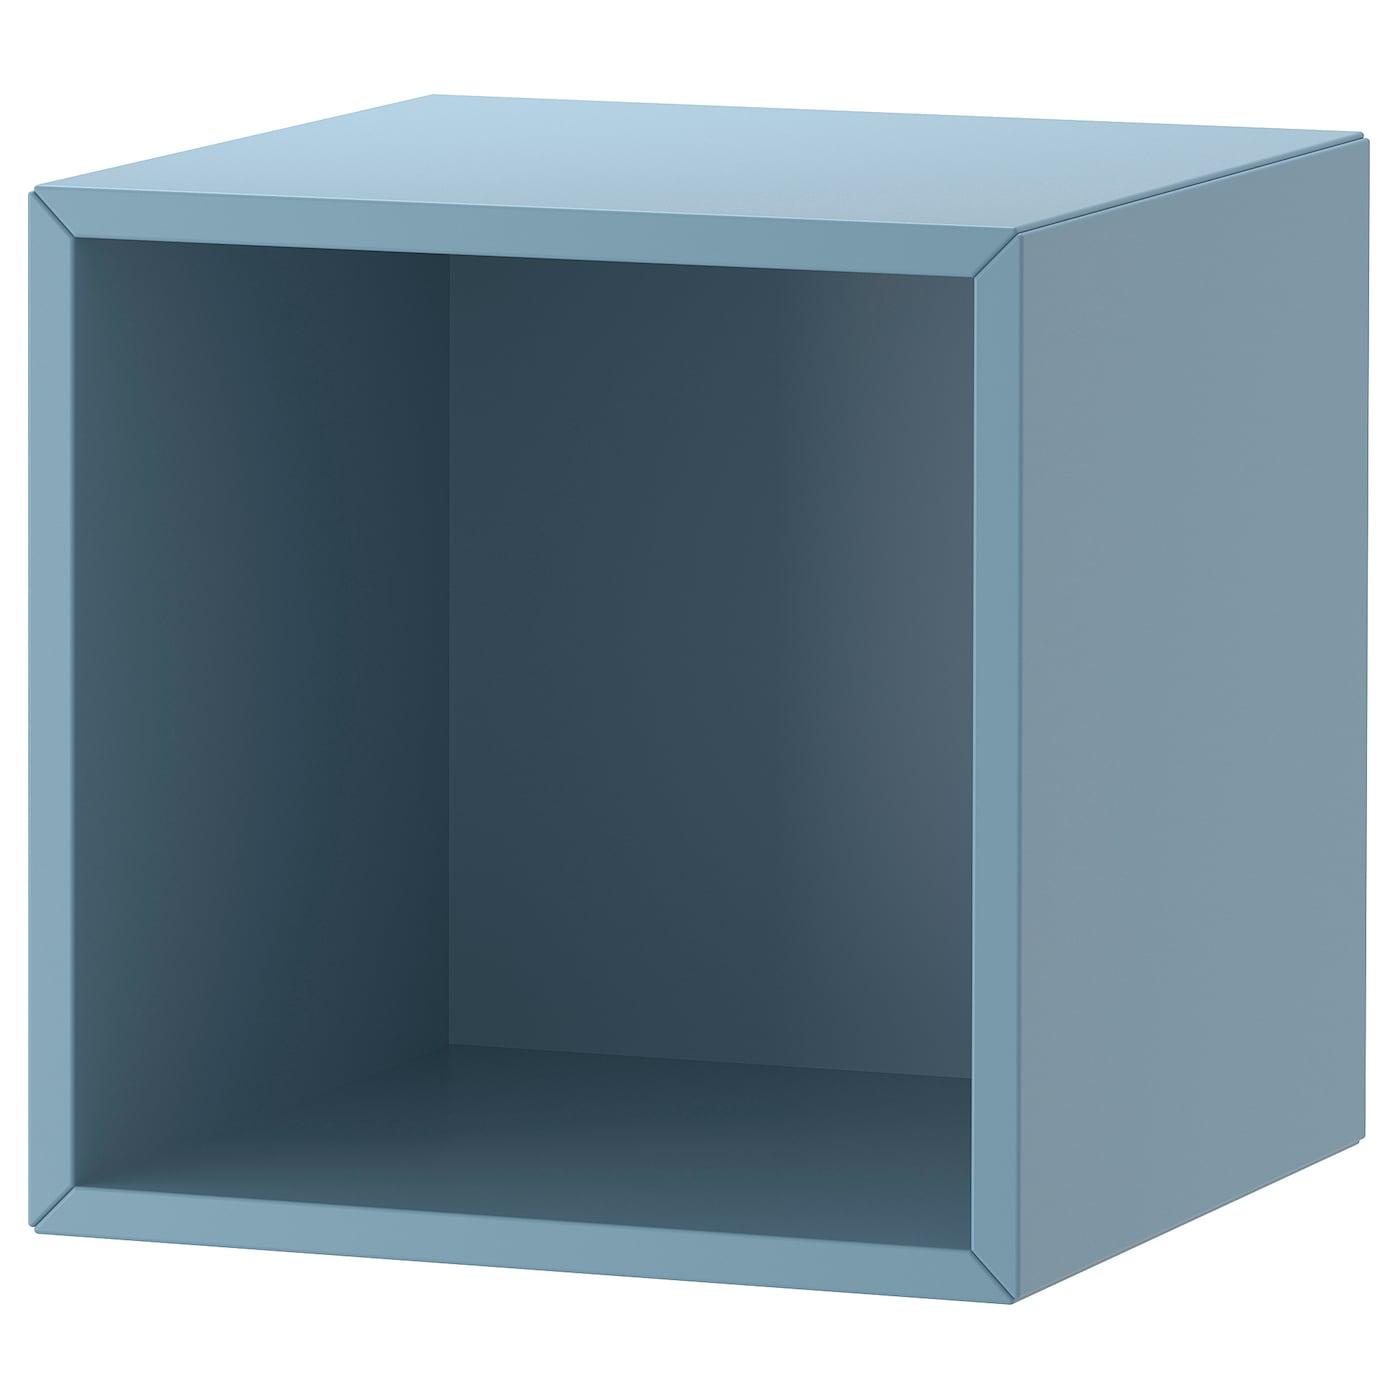 eket kast lichtblauw 35 x 35 x 35 cm ikea. Black Bedroom Furniture Sets. Home Design Ideas